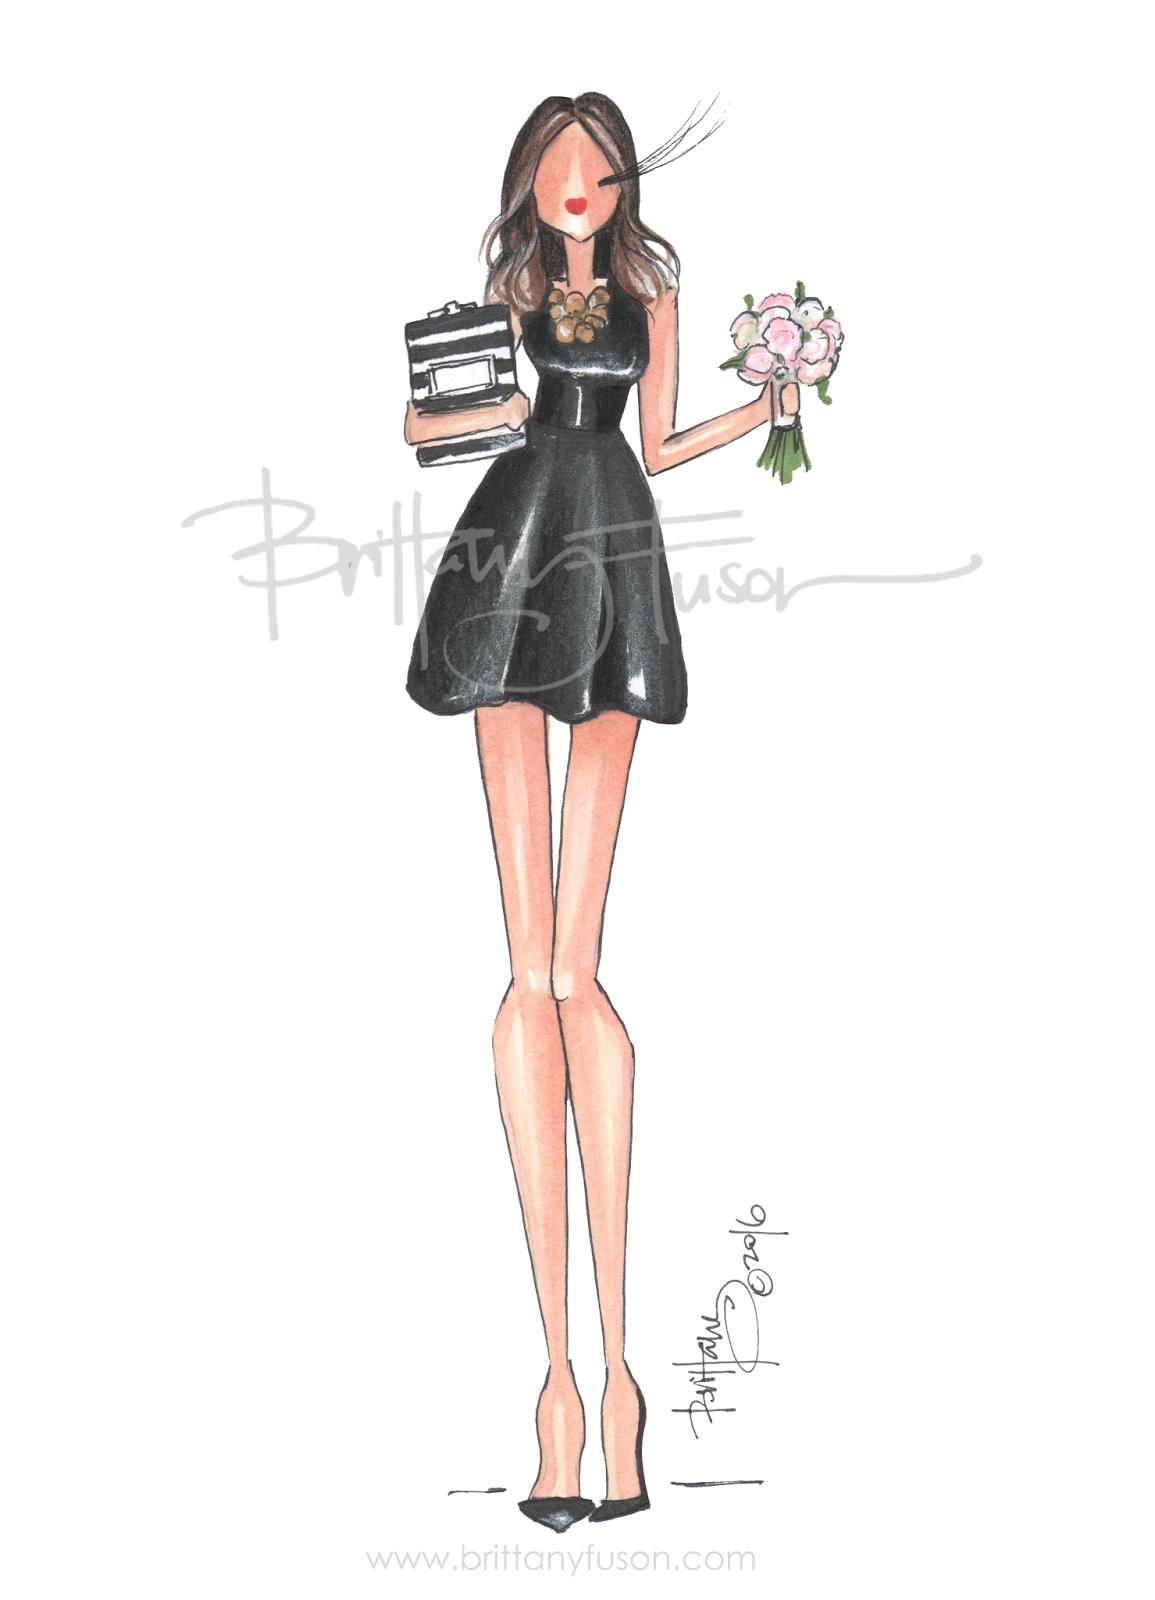 Weddings wedding planning fashion illustration will you be my